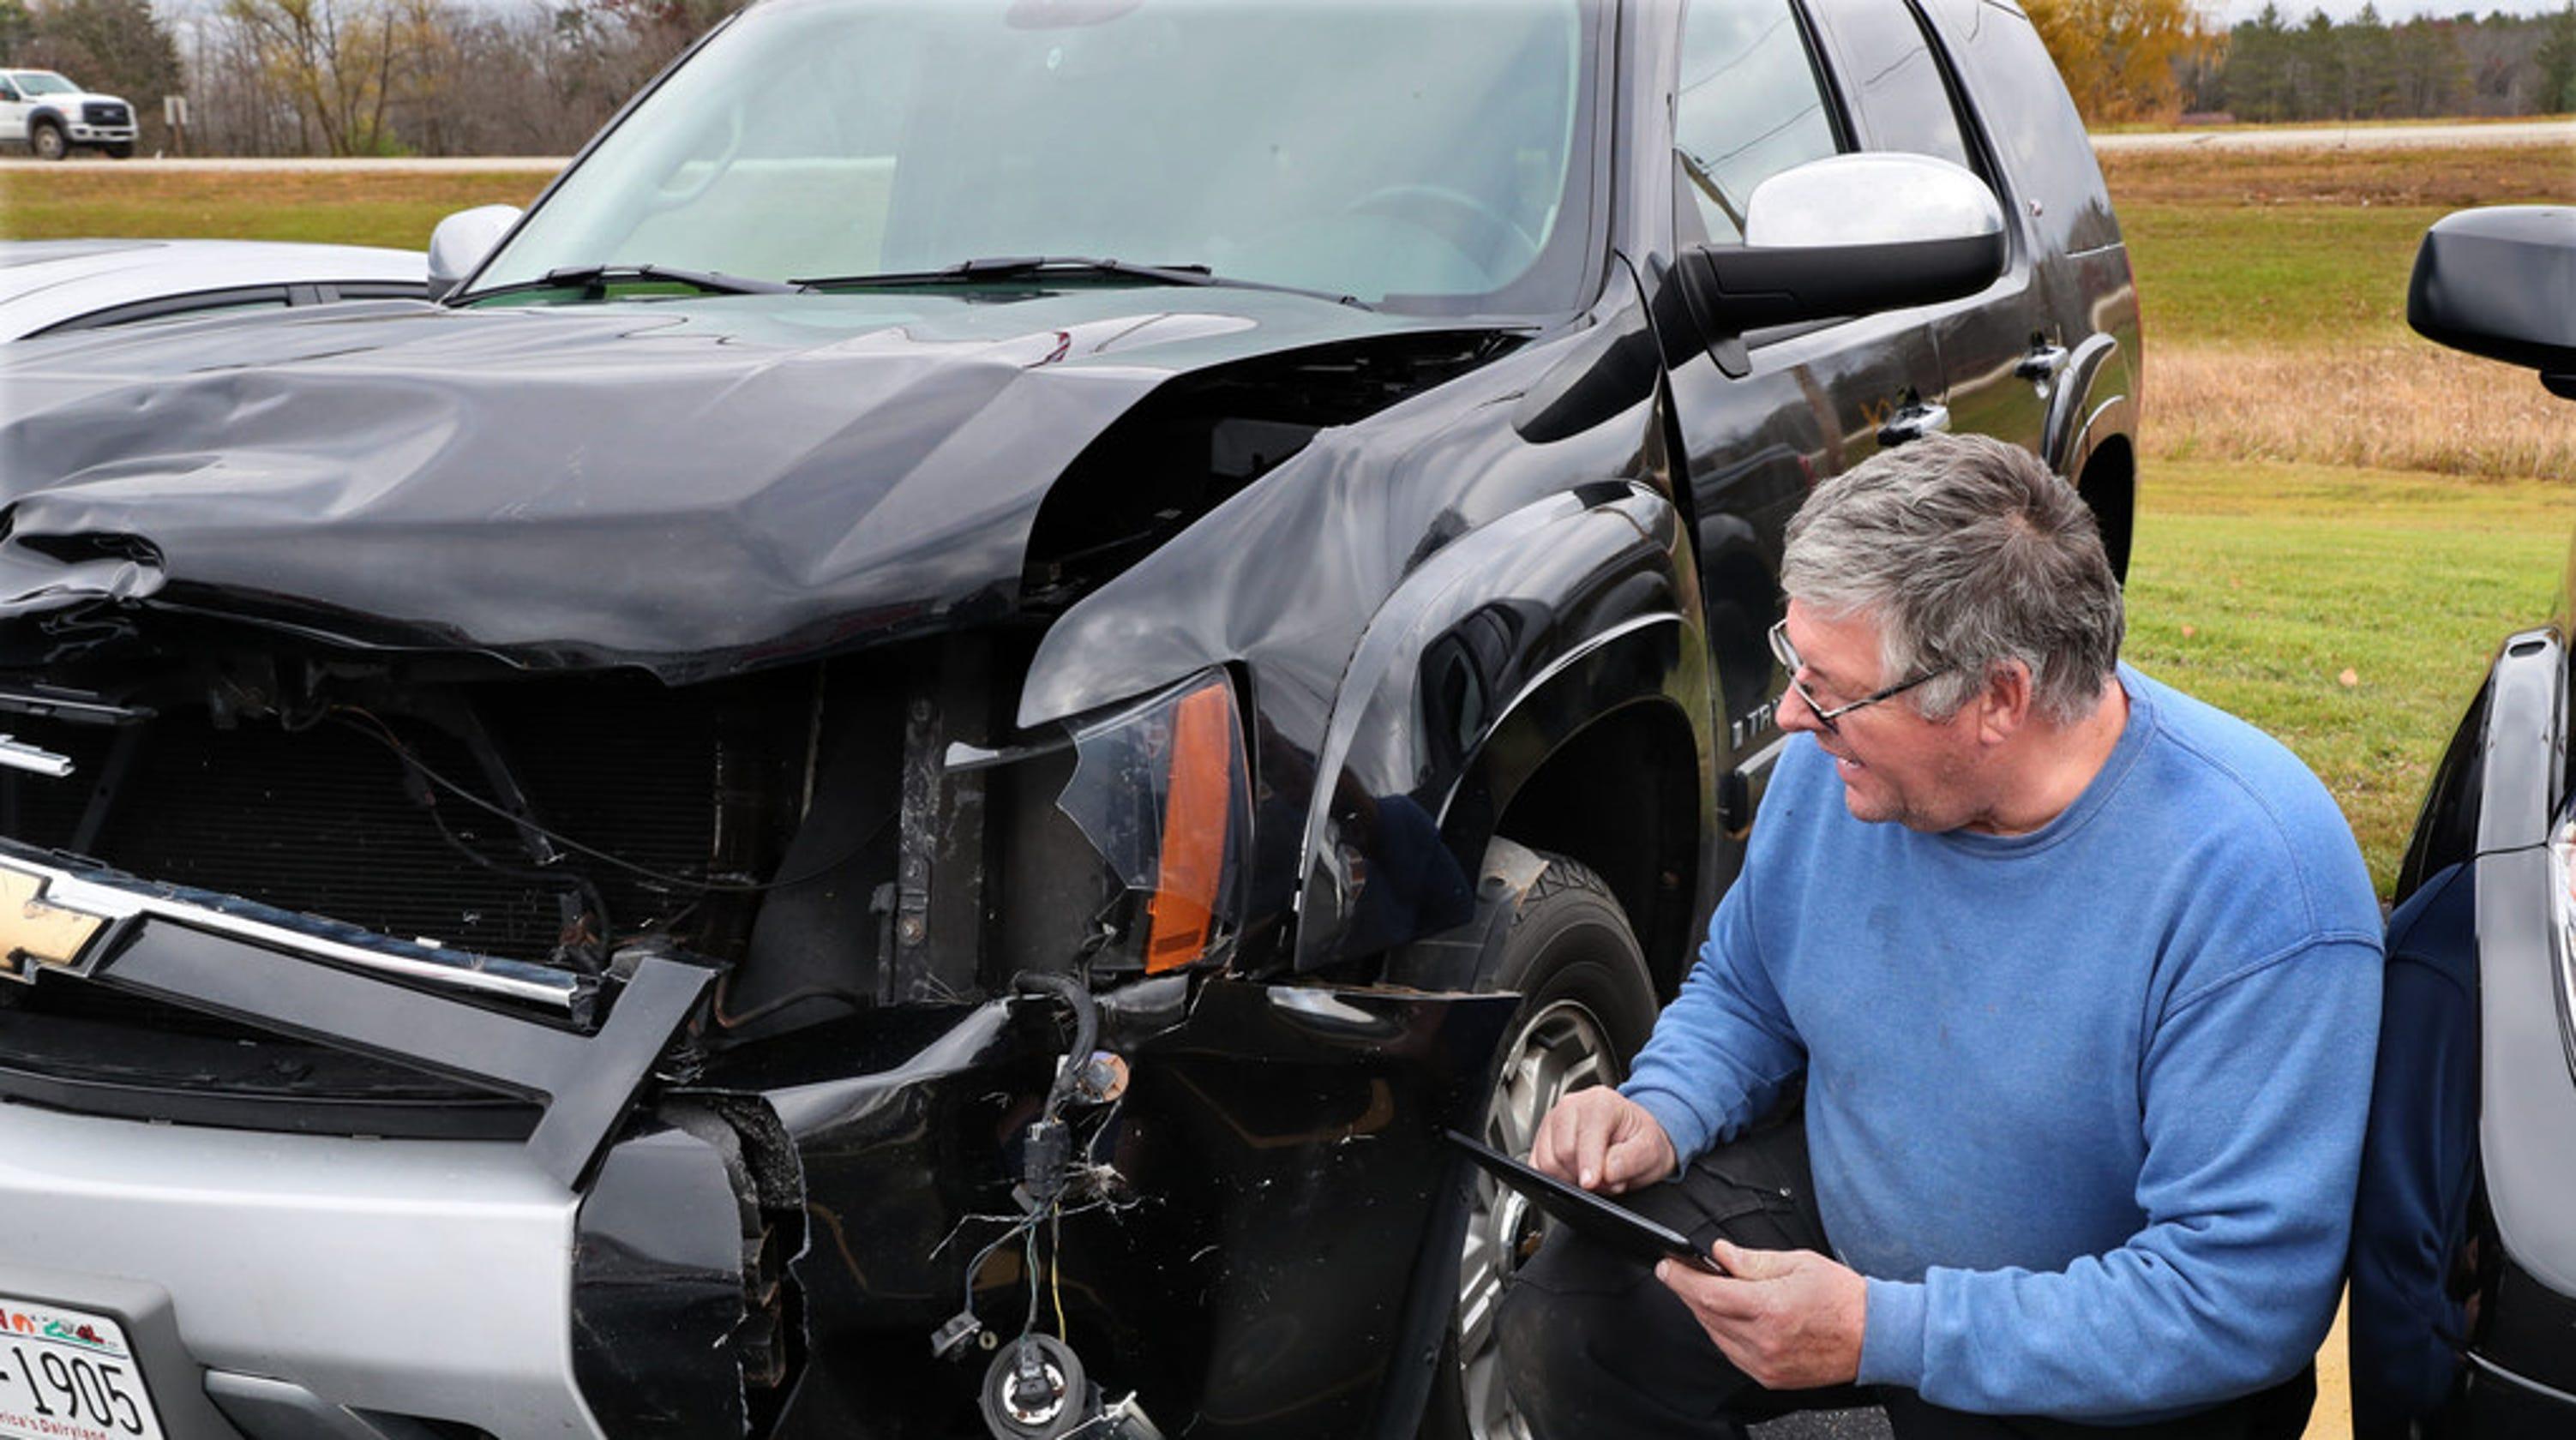 Deer accidents in Wisconsin peak in November